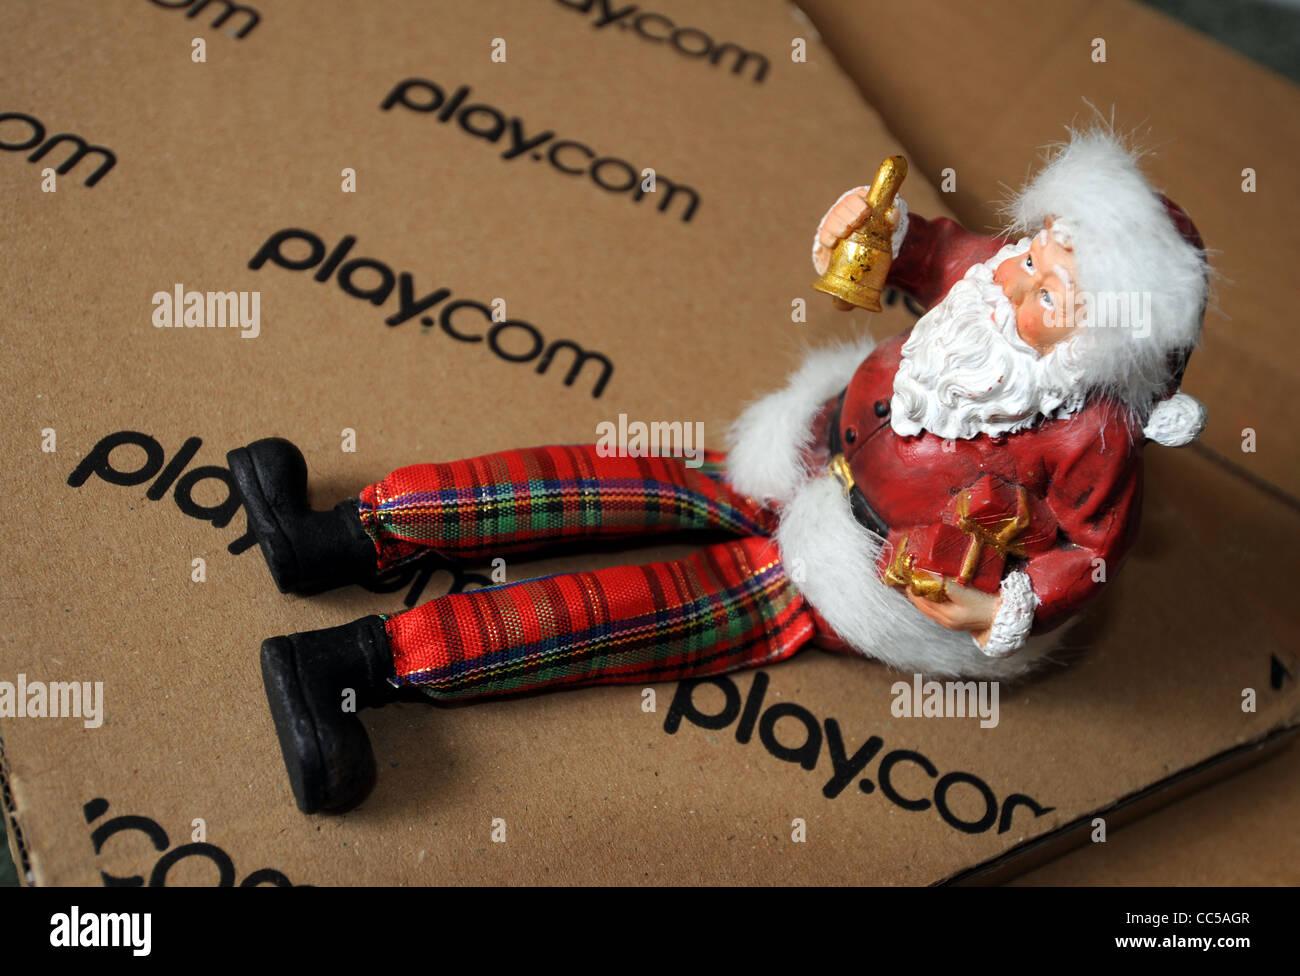 Online shopping at Play.com at Christmas, UK - Stock Image